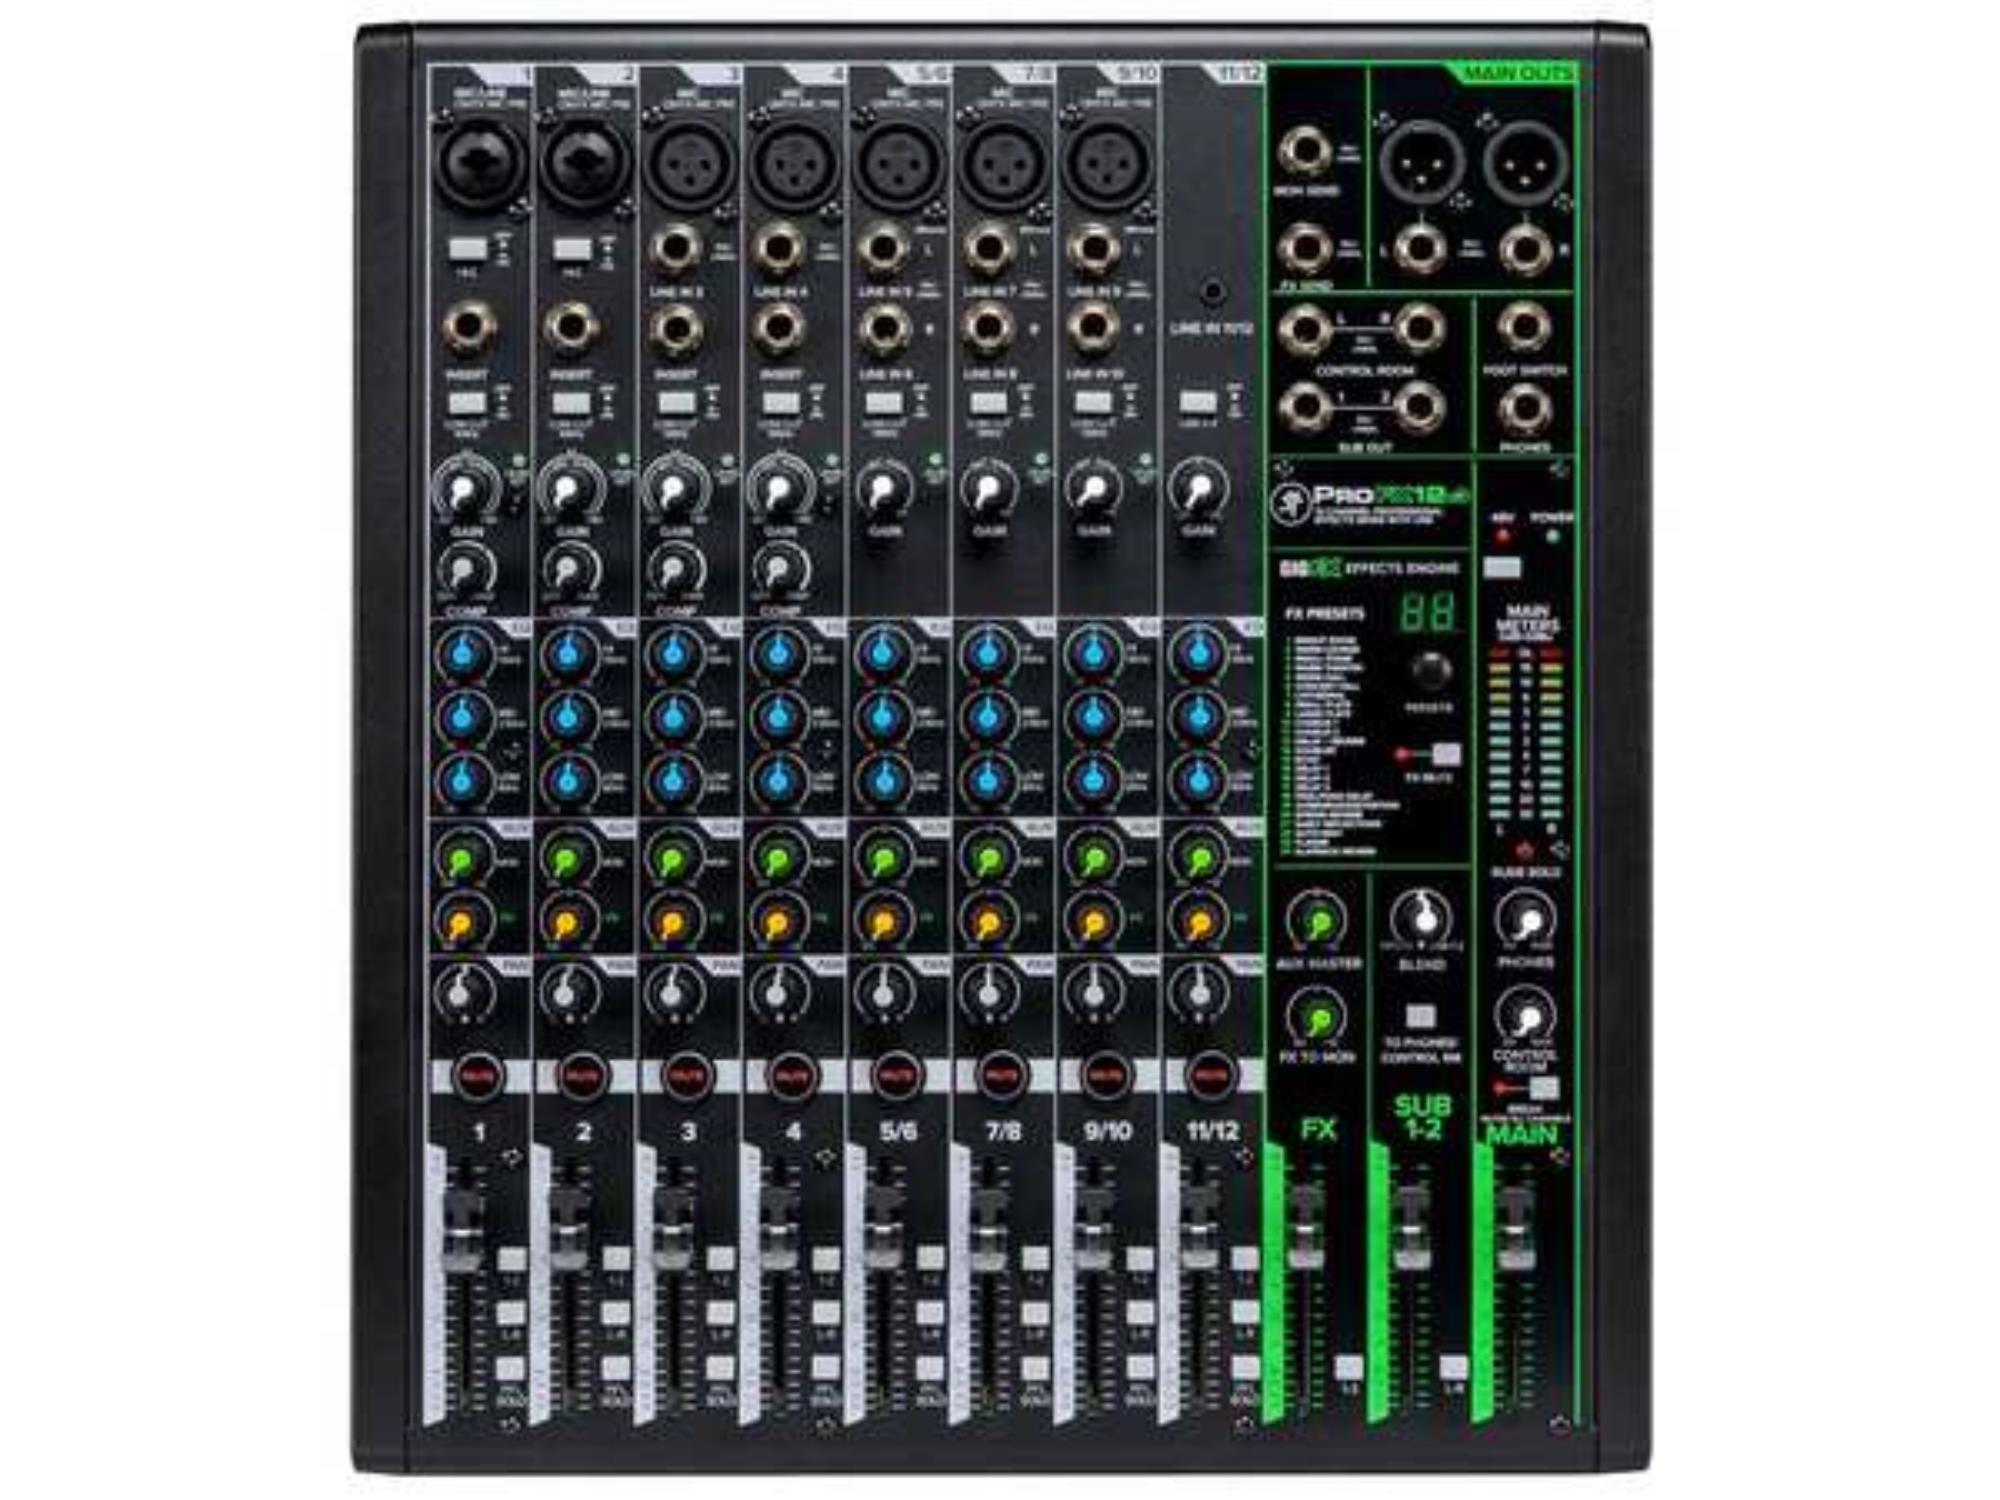 MACKIE-ProFX16v3-MIXER-sku-24590